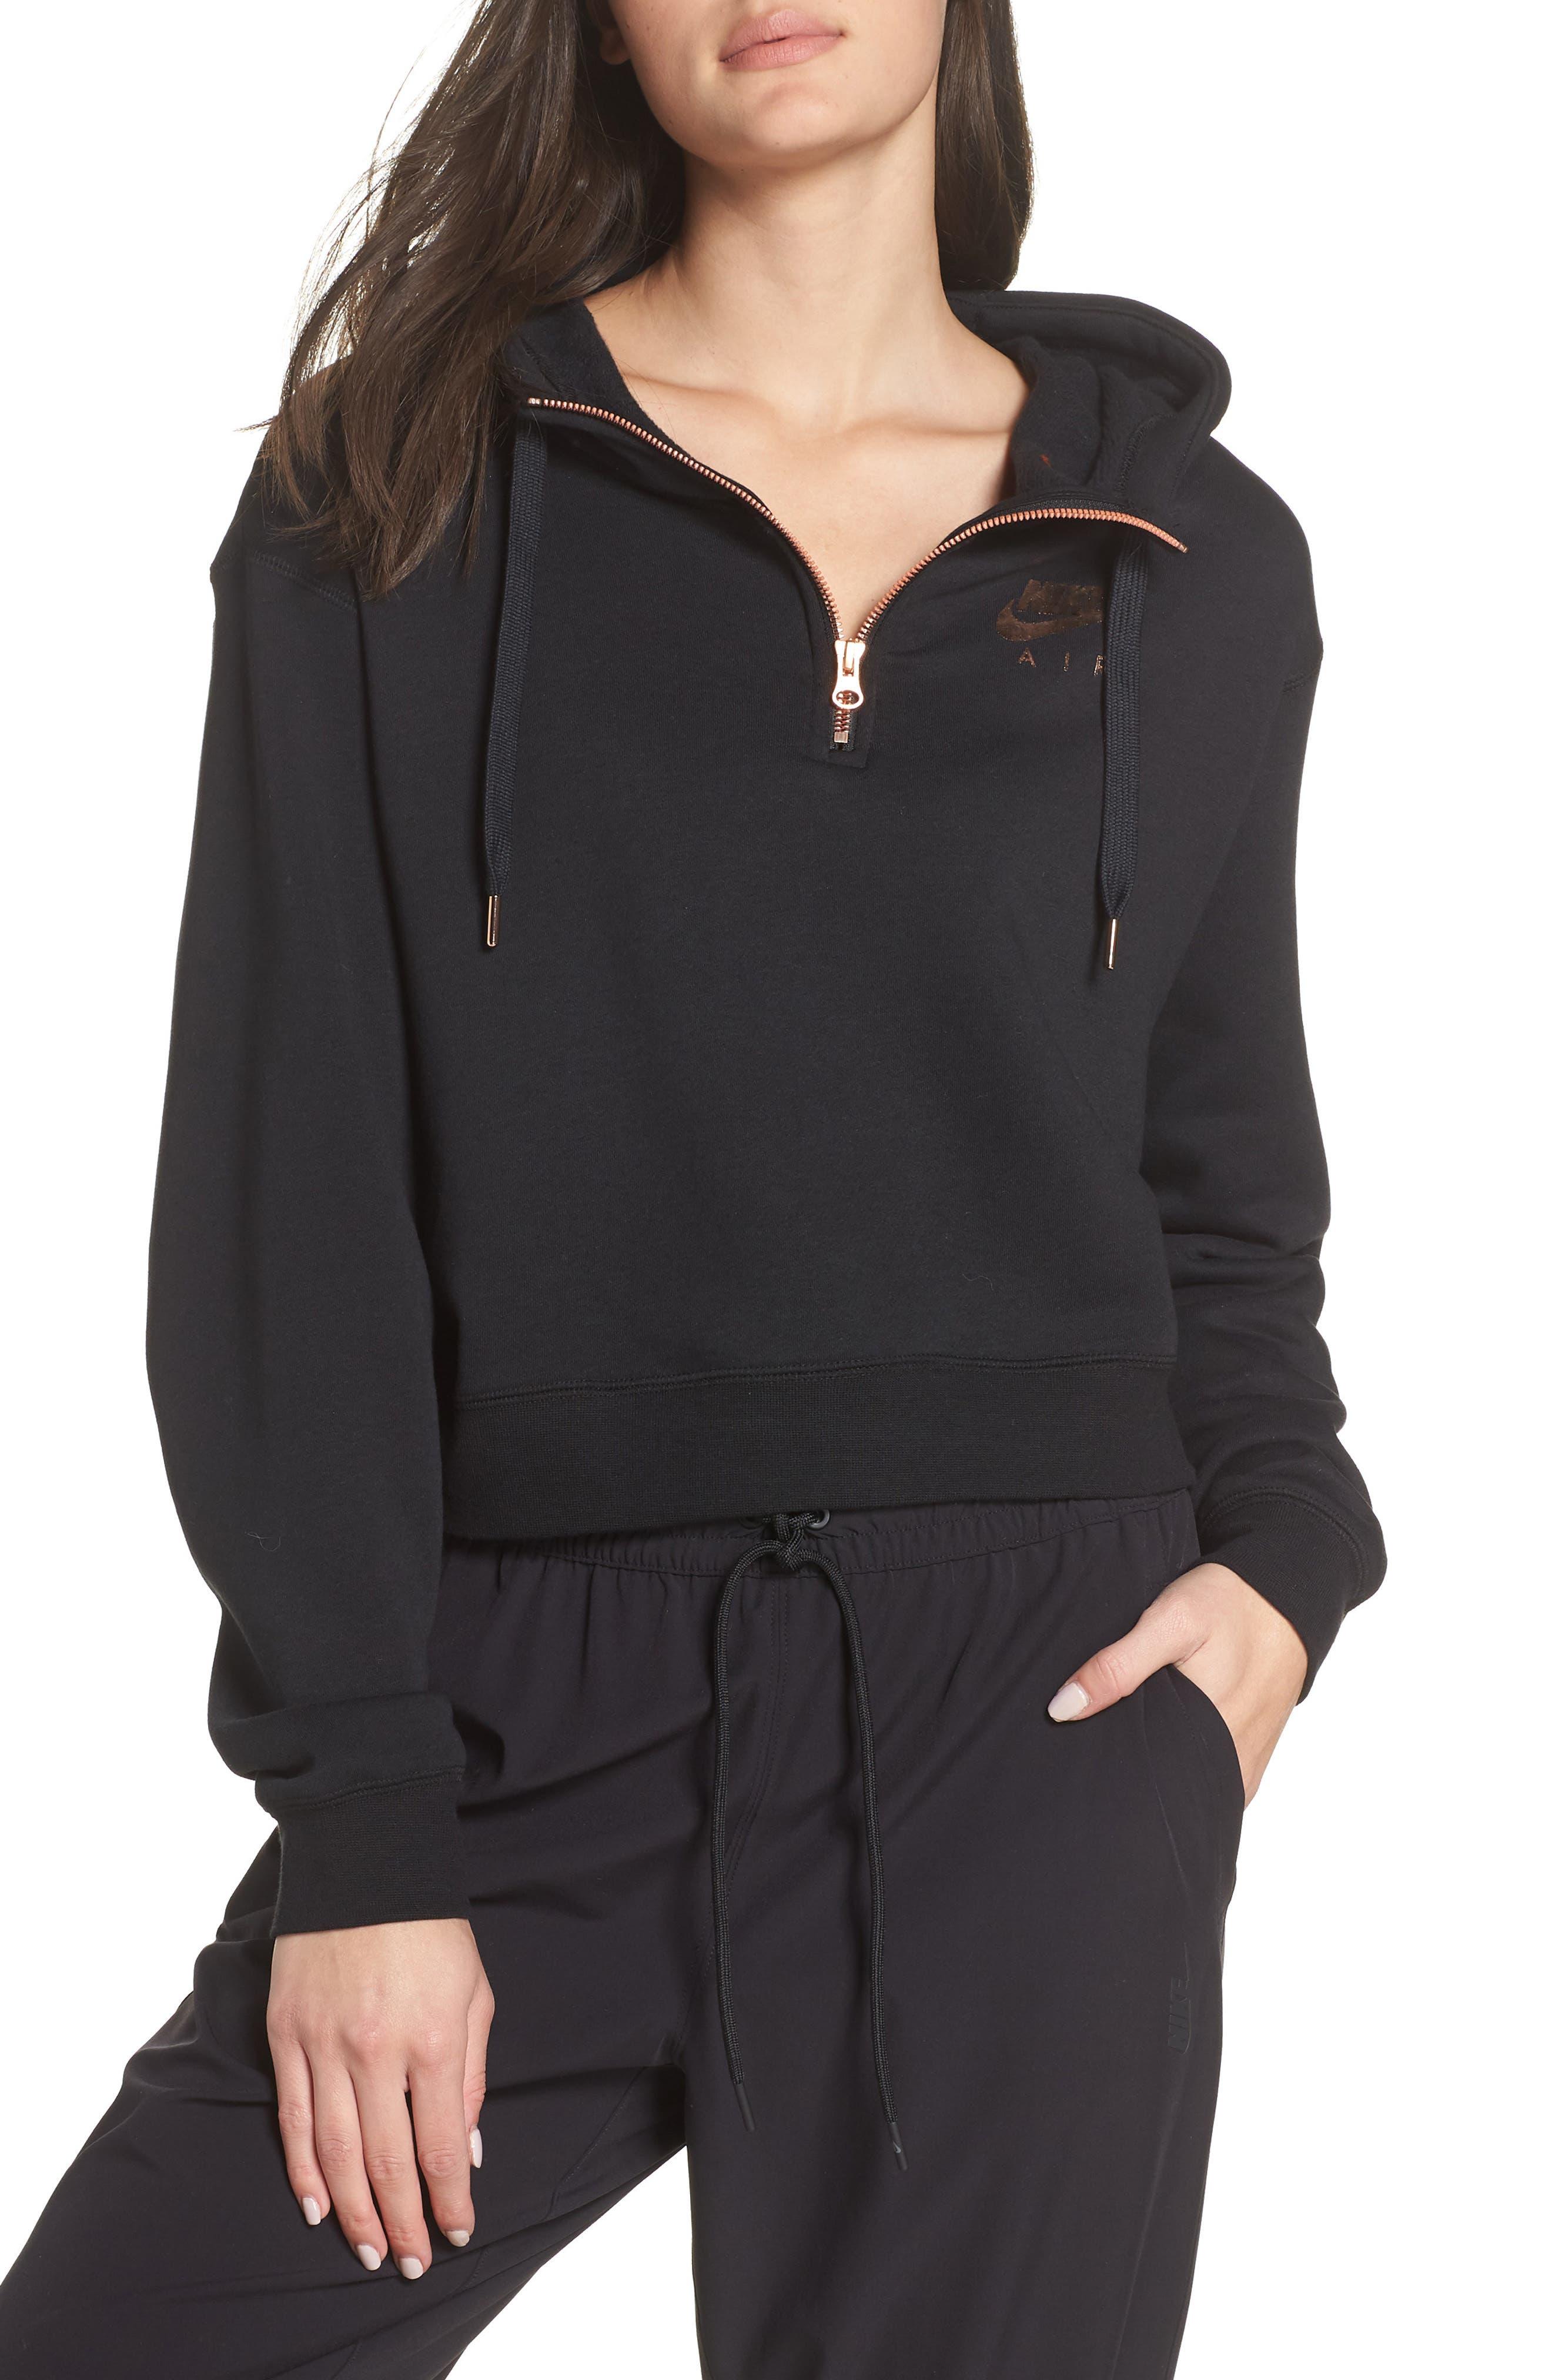 Sportswear Women's Half Zip Fleece Hoodie,                         Main,                         color, BLACK/ BLACK/ ROSE GOLD